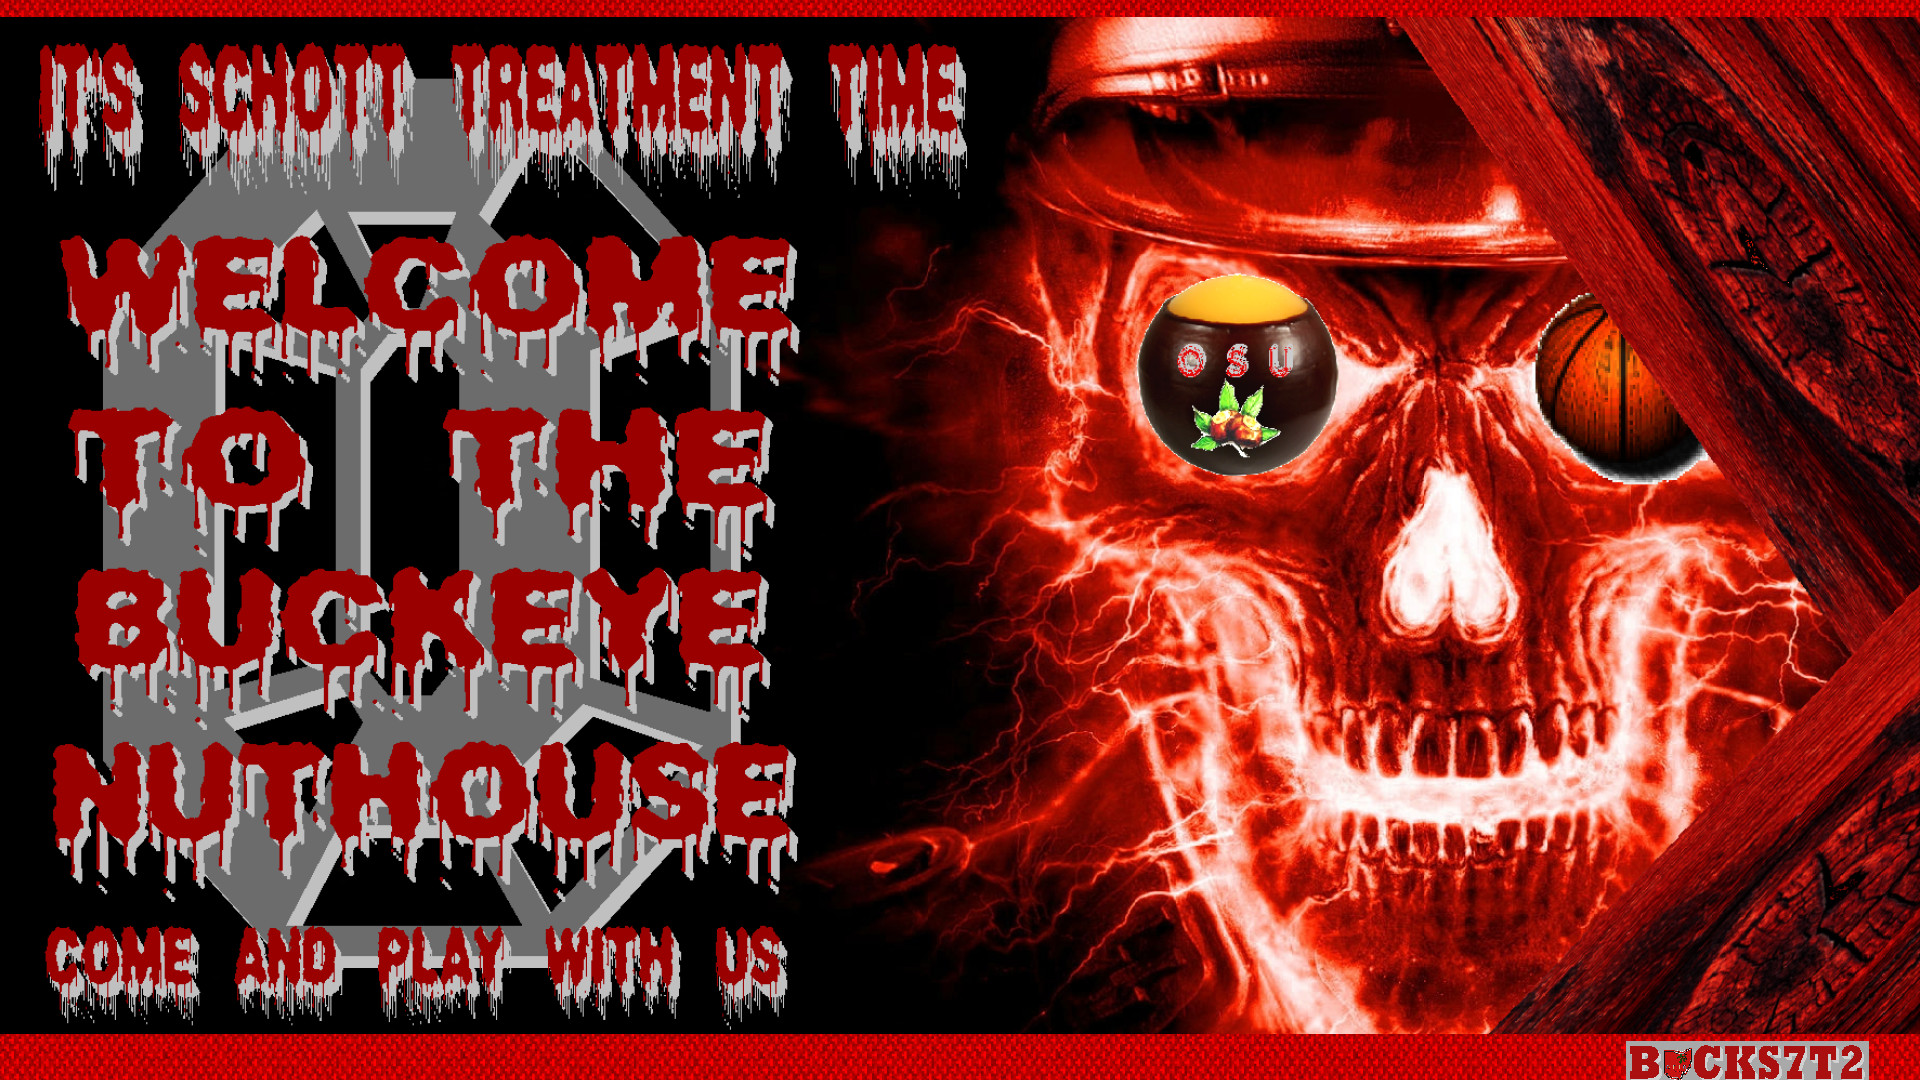 OSU-WALLPAPER-IT-S-SCHOTT-TREATMENT-TIME-ohio-